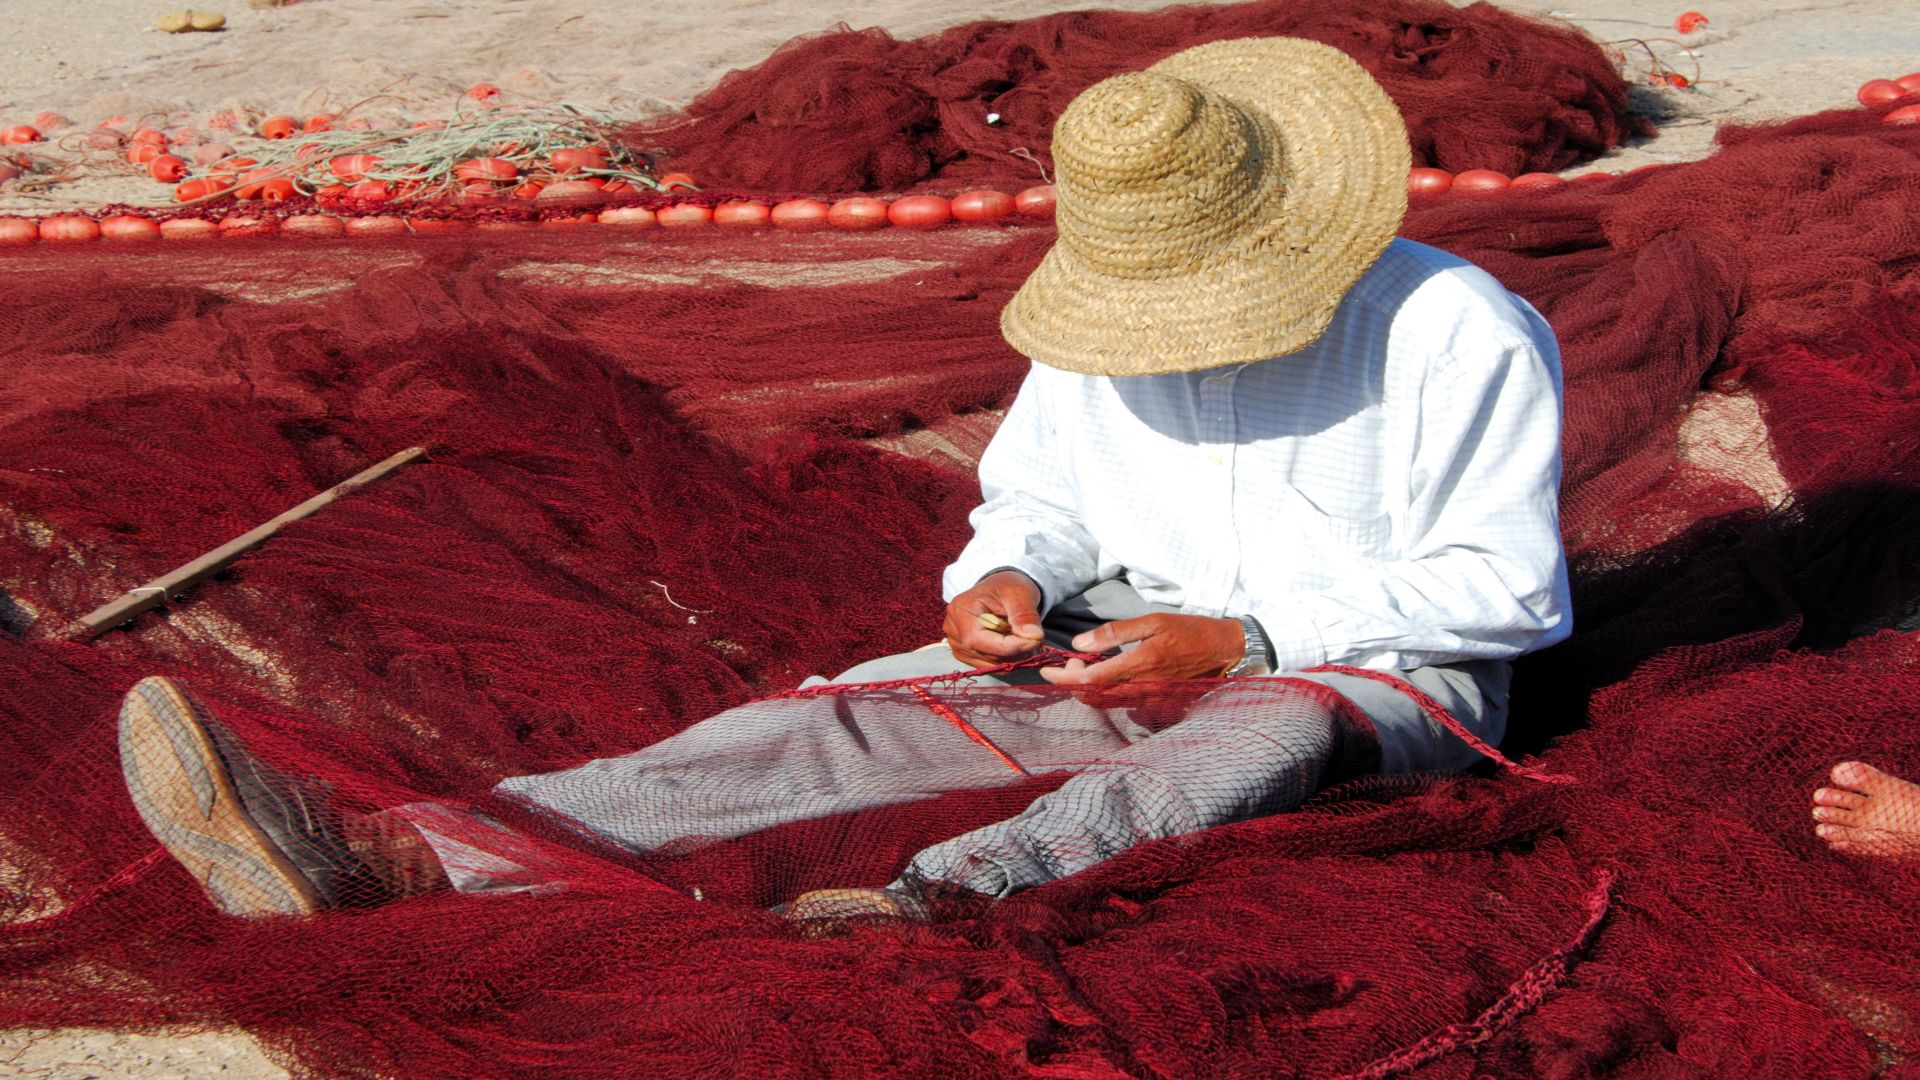 Visser met hoed repareert rode visnetten, Essaouira, Marokko